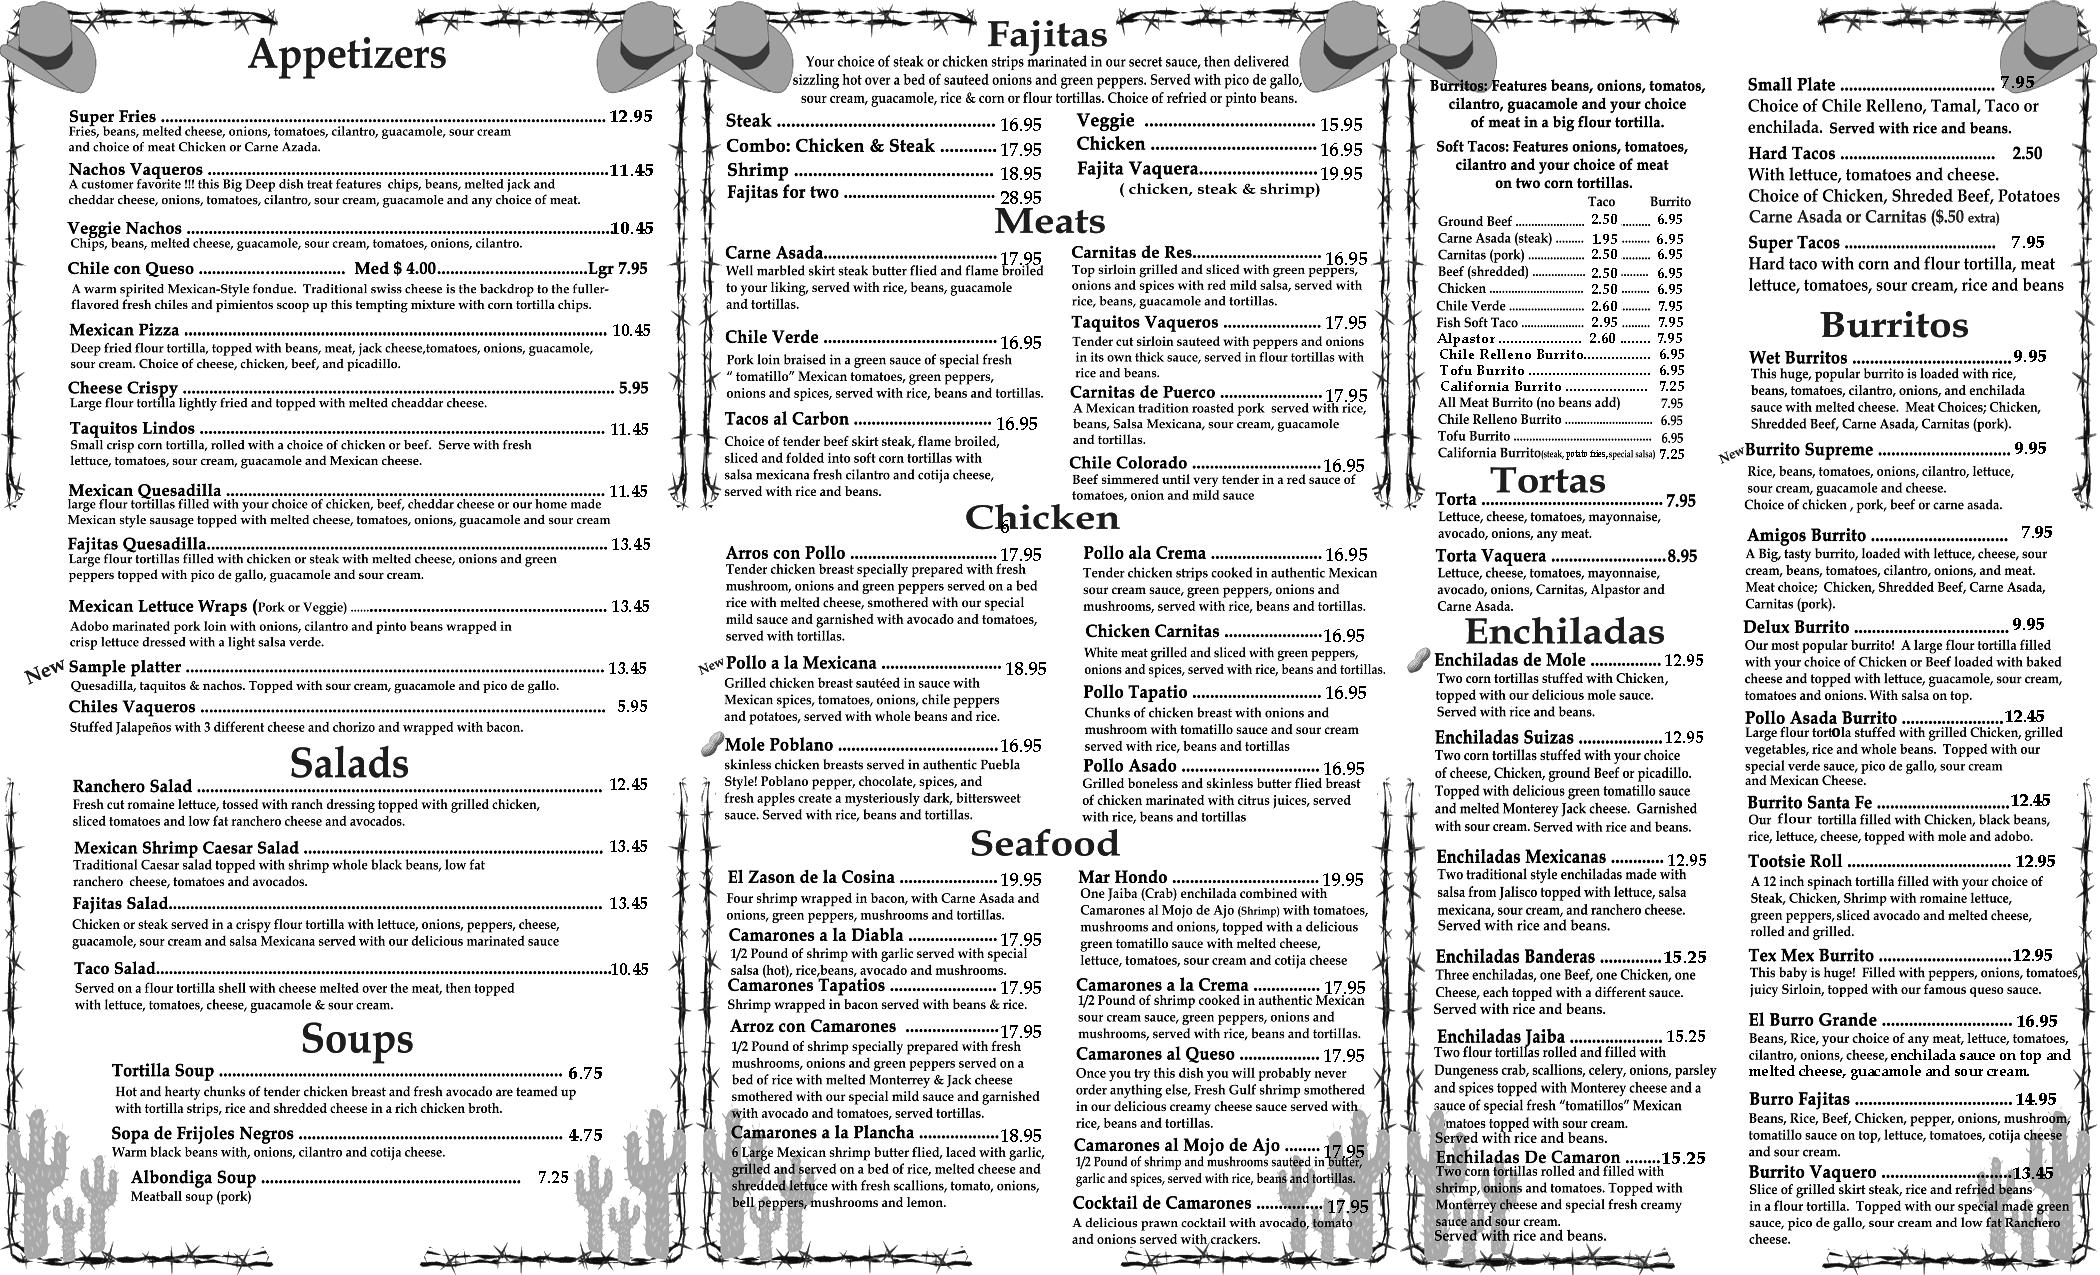 BurritoVaquero To Go Menu: Appetizers, Fajitas, Meats and burritos